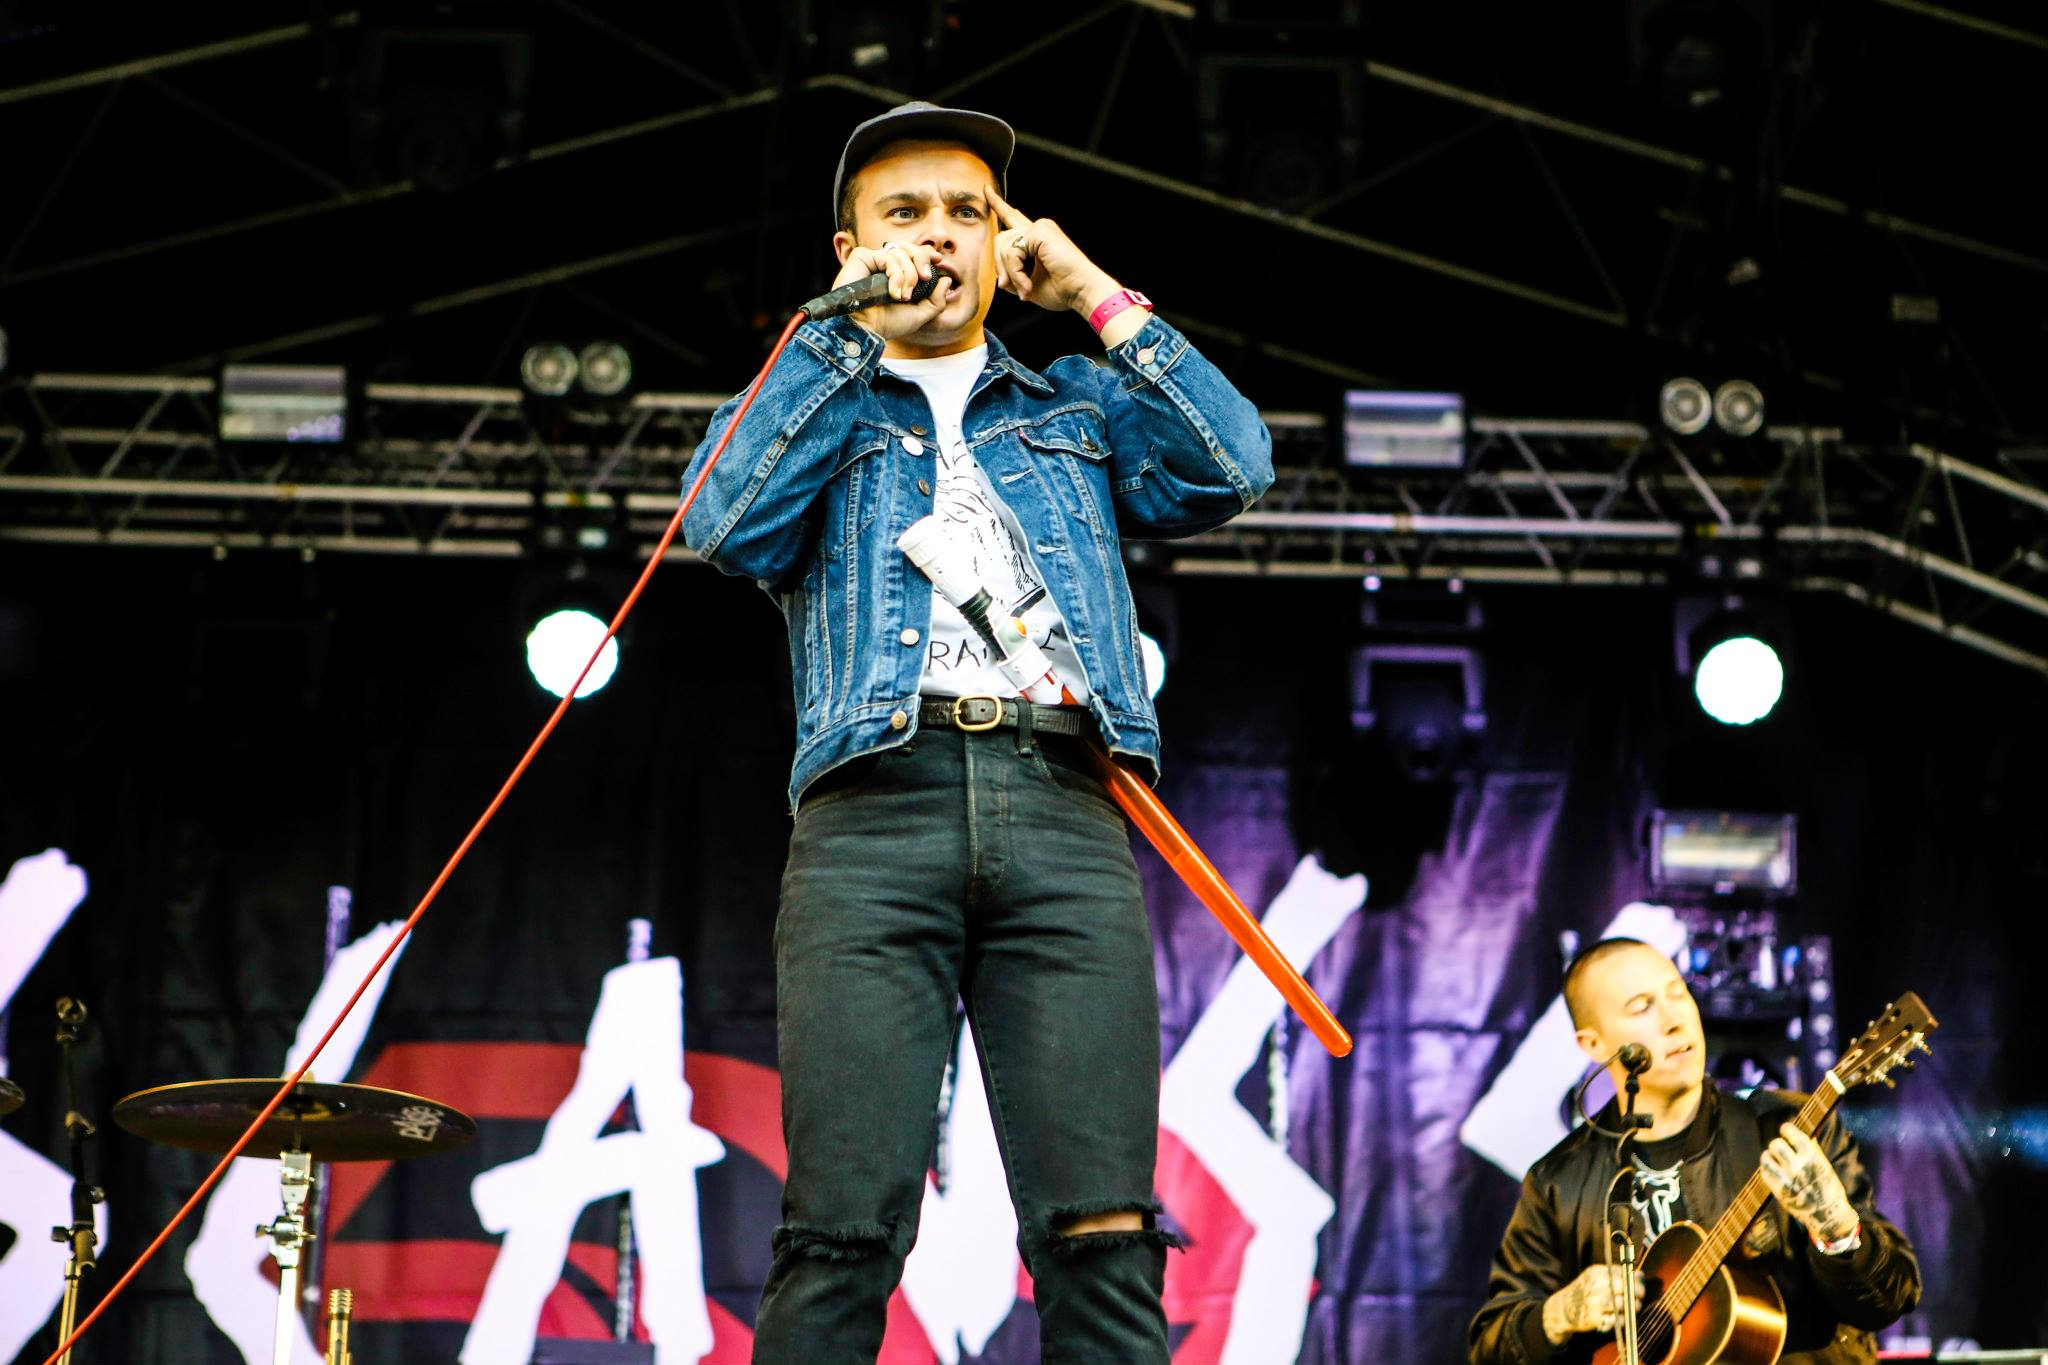 Festival Review: Tramlines 2015